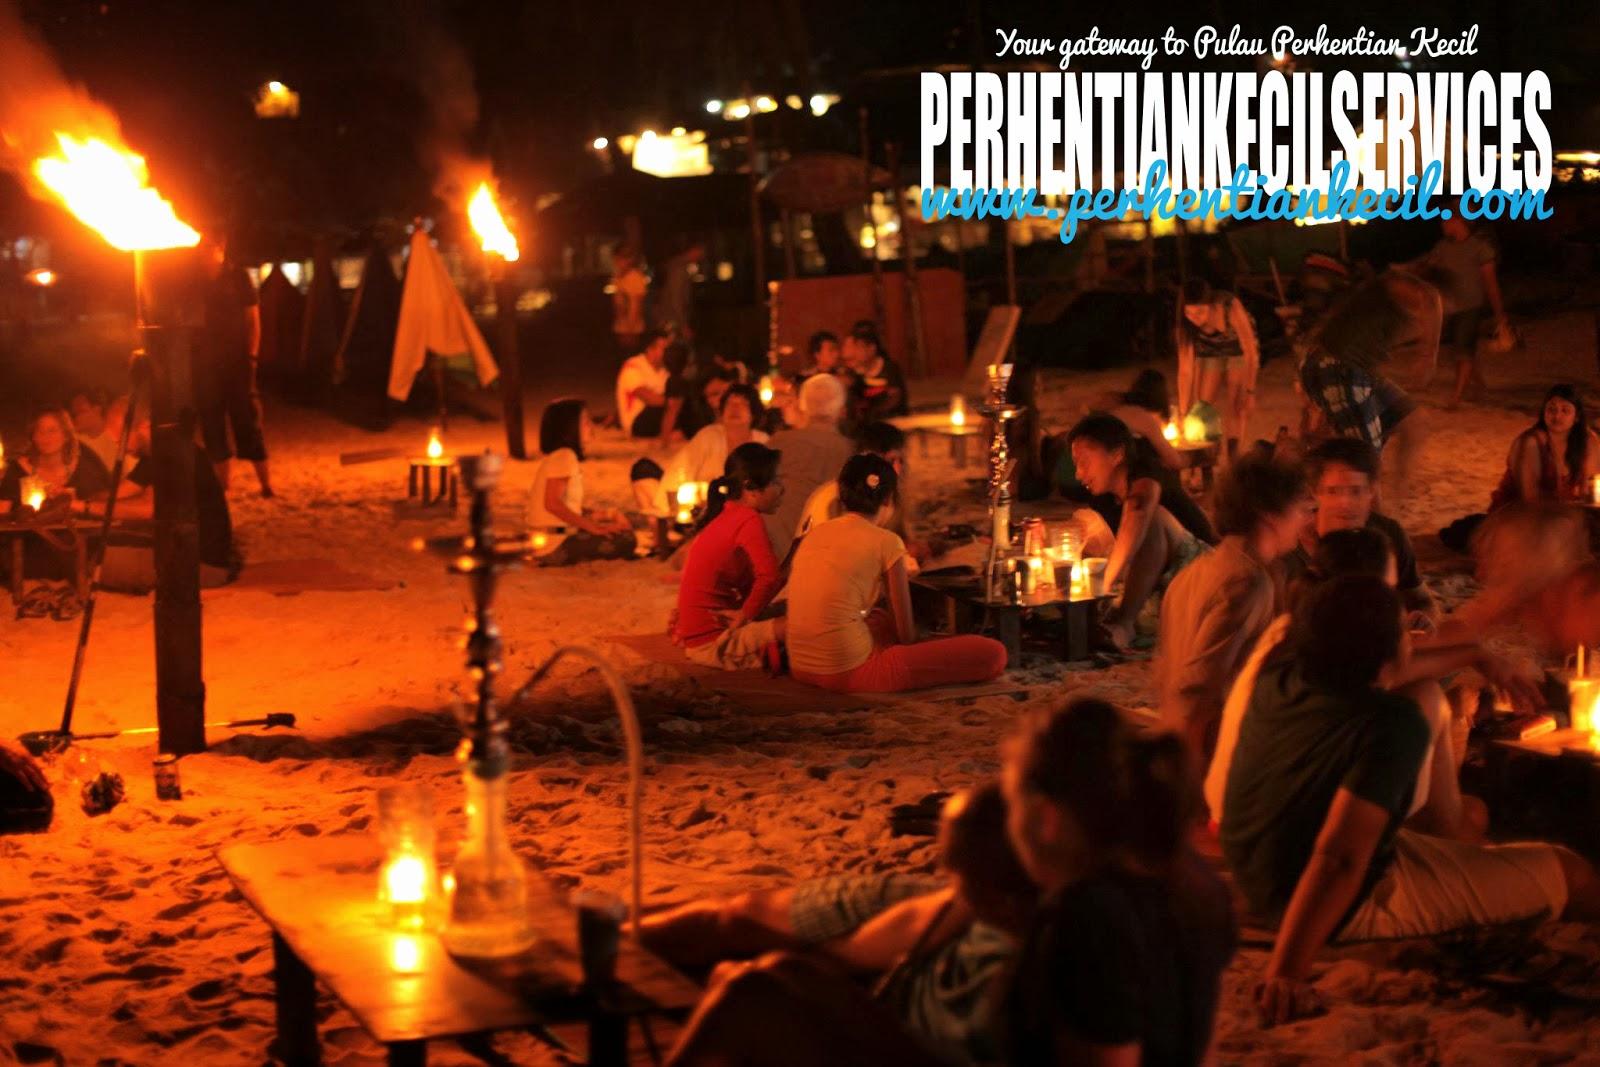 nightlife in pulau perhentian kecil, long beach perhentian island, perhentian kecil services, perhentian packages, pakej pulau perhentian kecill, promosi pakej percutian pulau perhentian kecil, pakej murah pulau perhentian